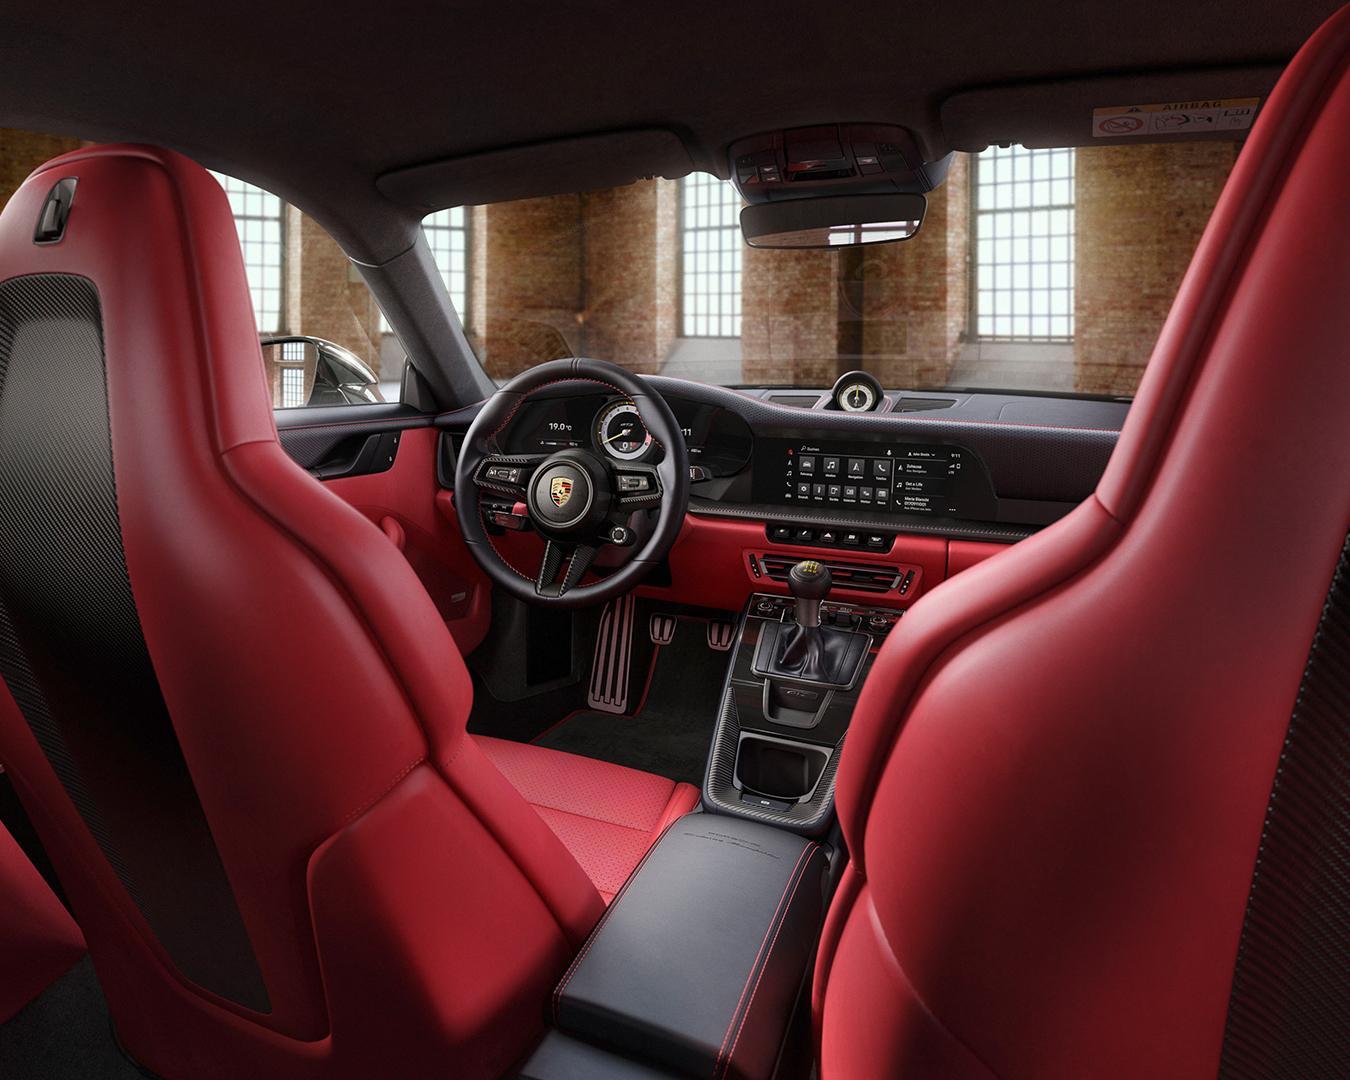 Porsche-911-GT3-Touring-by-Porsche-Exclusive-Manufaktur-4